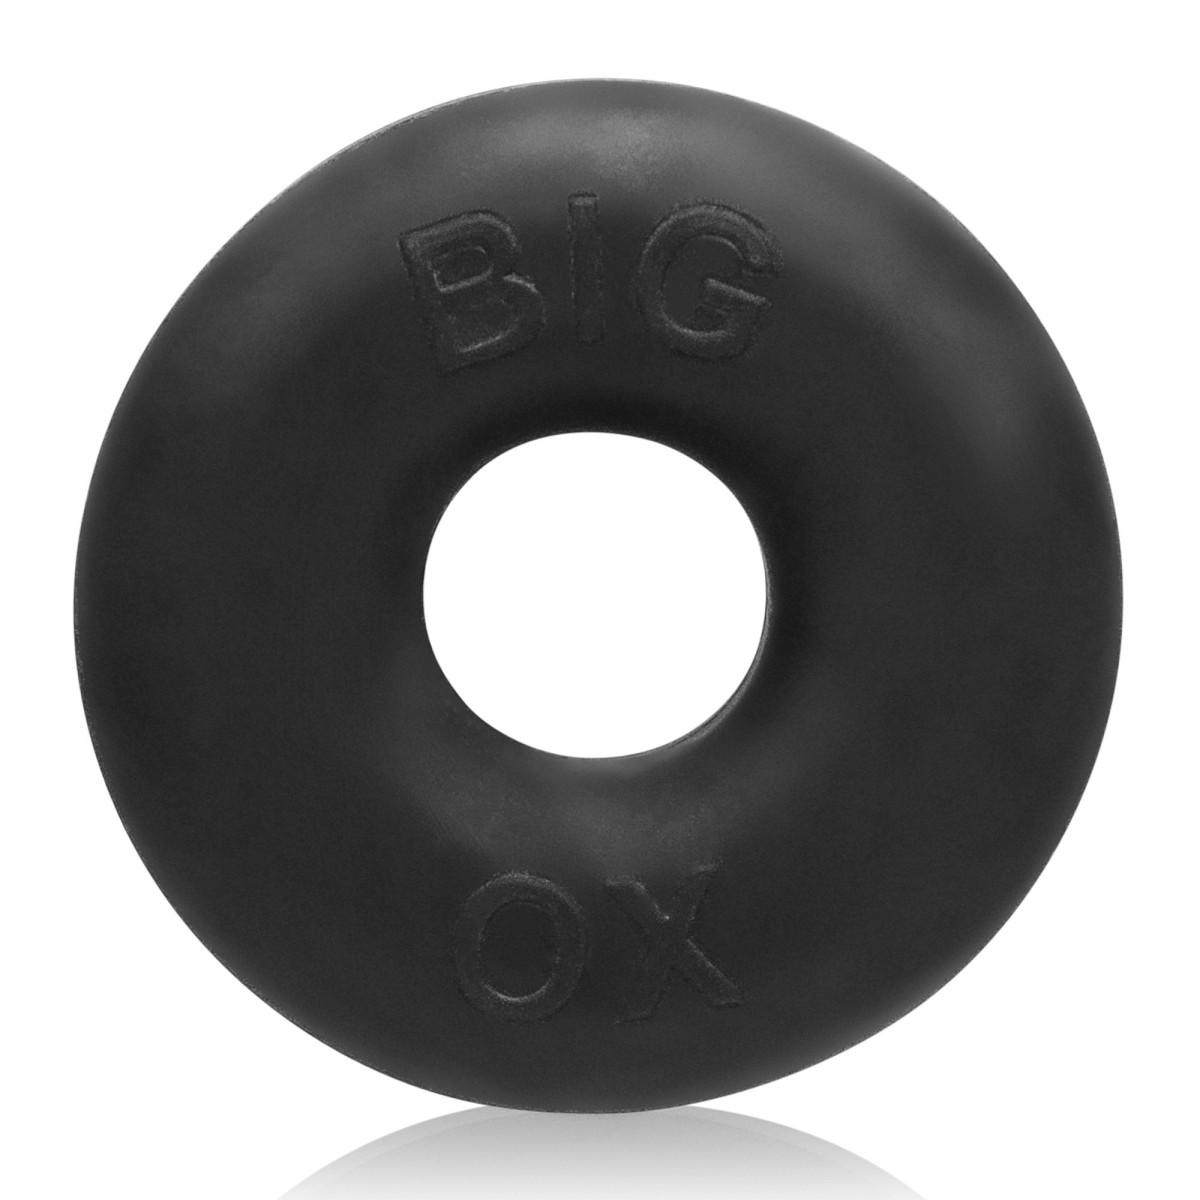 Oxballs Big Ox Cock Ring Black Ice